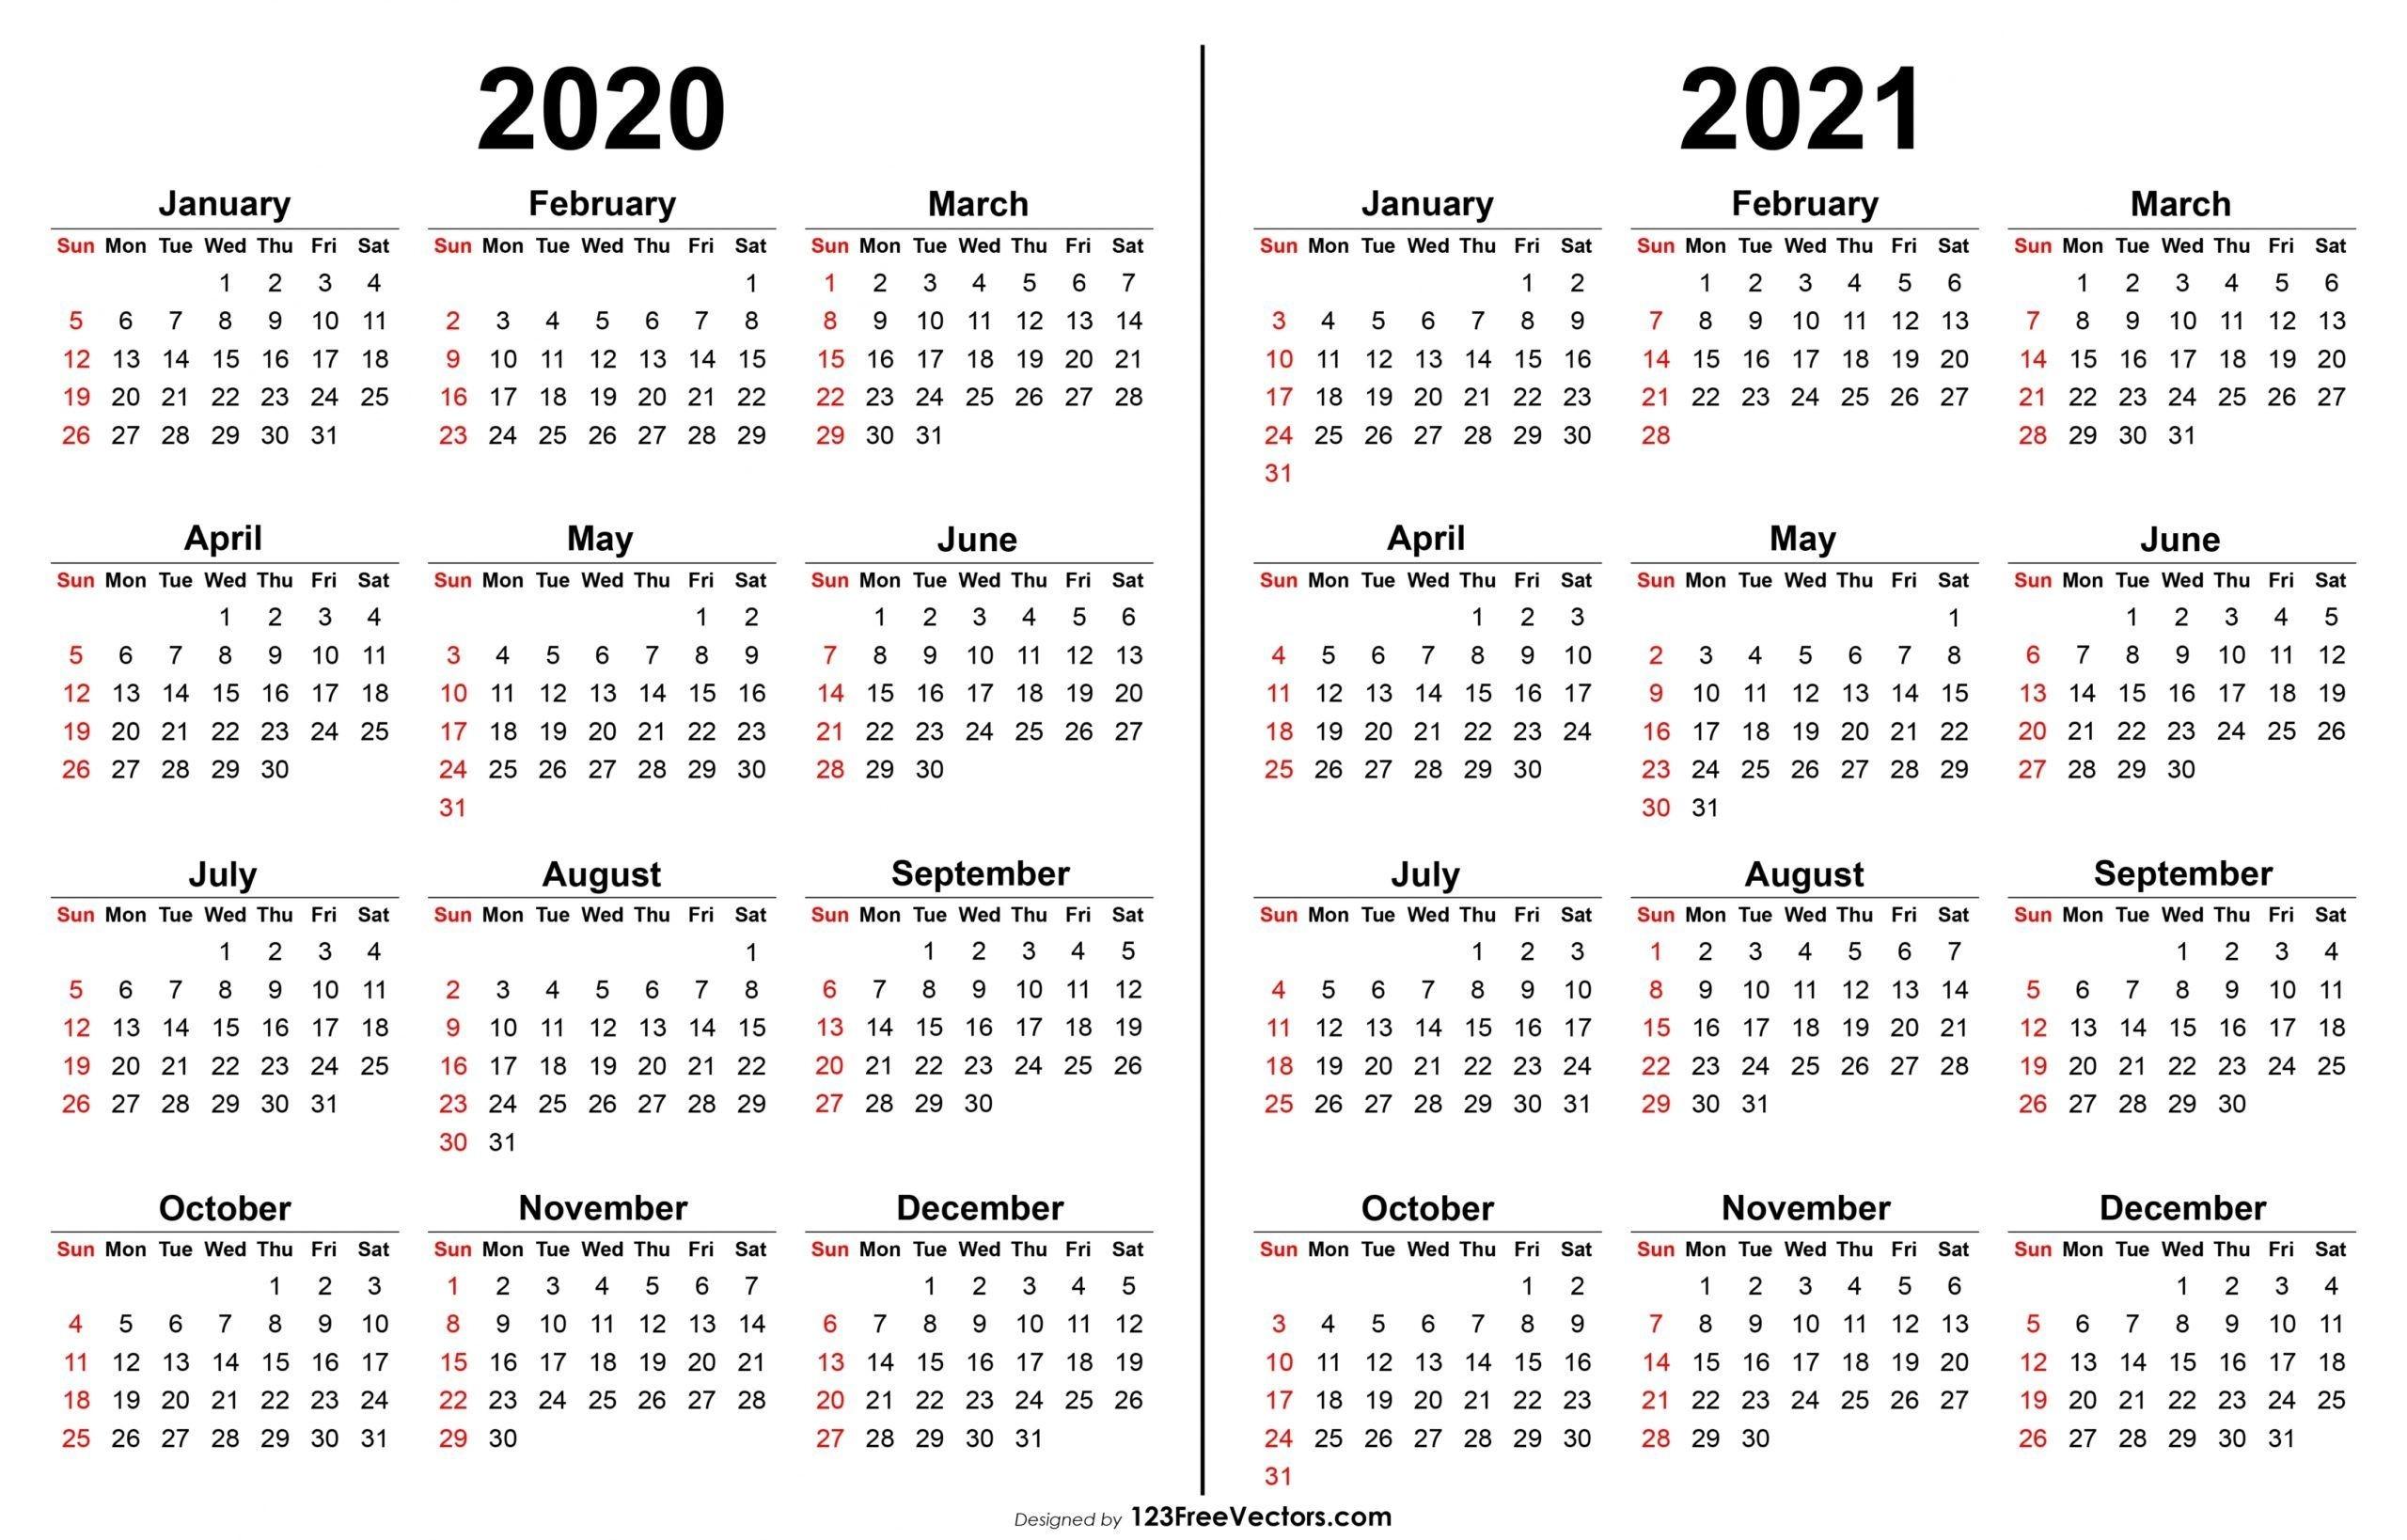 2020 2021 Printable Calendar Di 2020  Printable 12 Month 2020 2021 Calendar